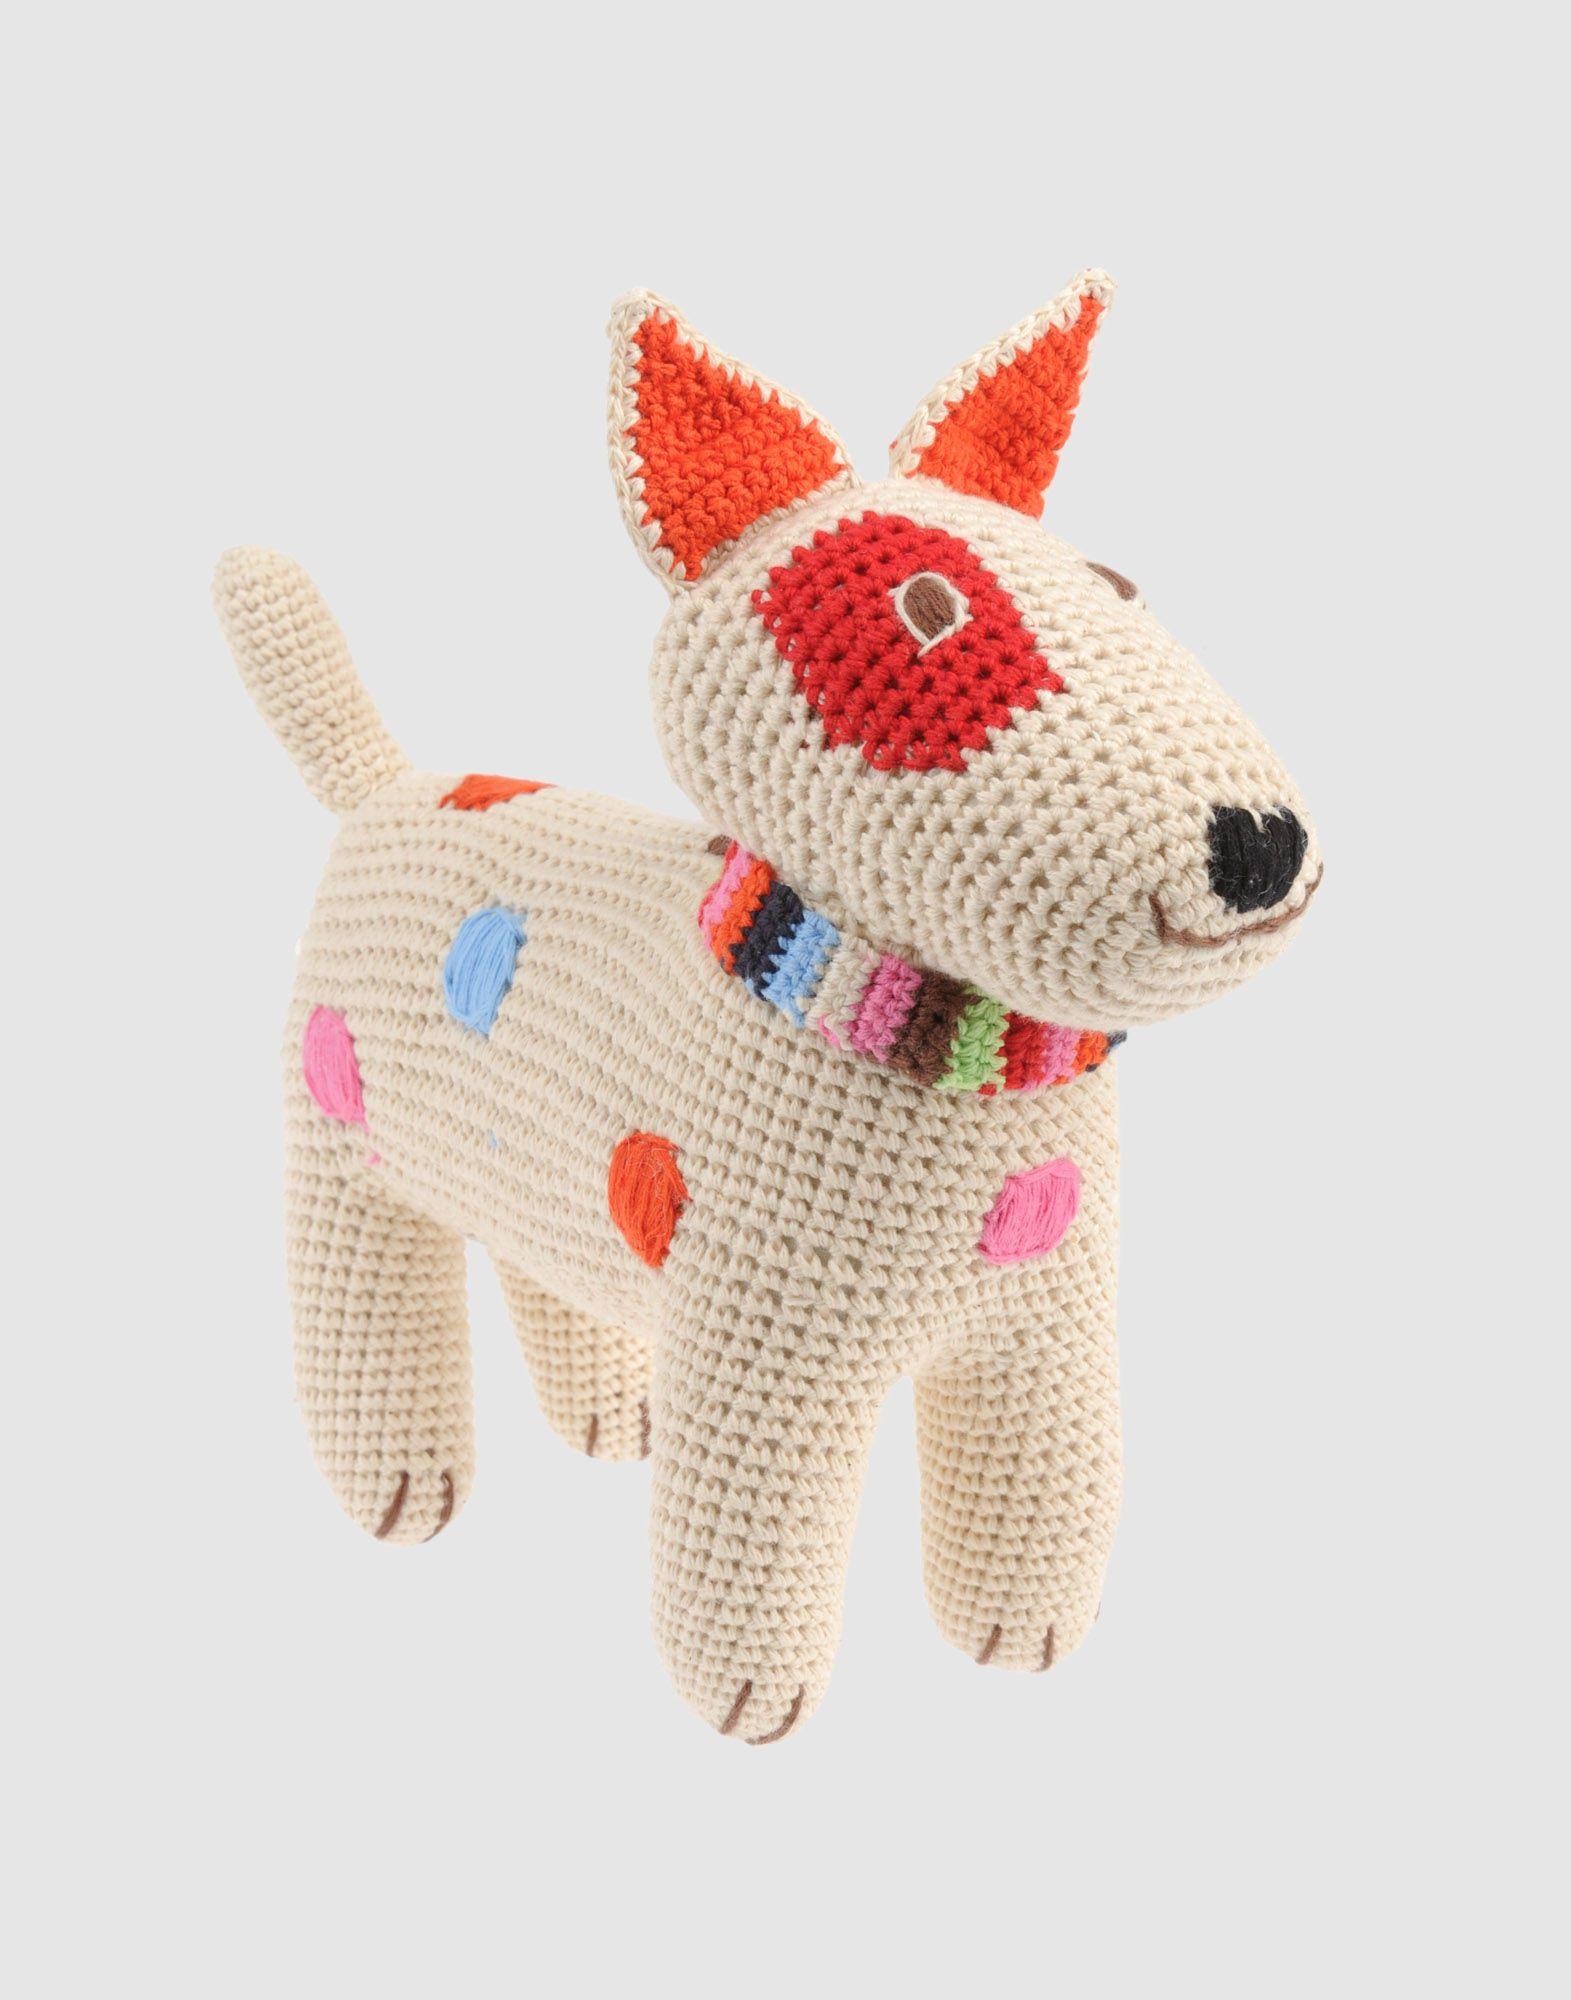 Pin de Aire Puro Accesorios en crochet | Pinterest | Animales ...